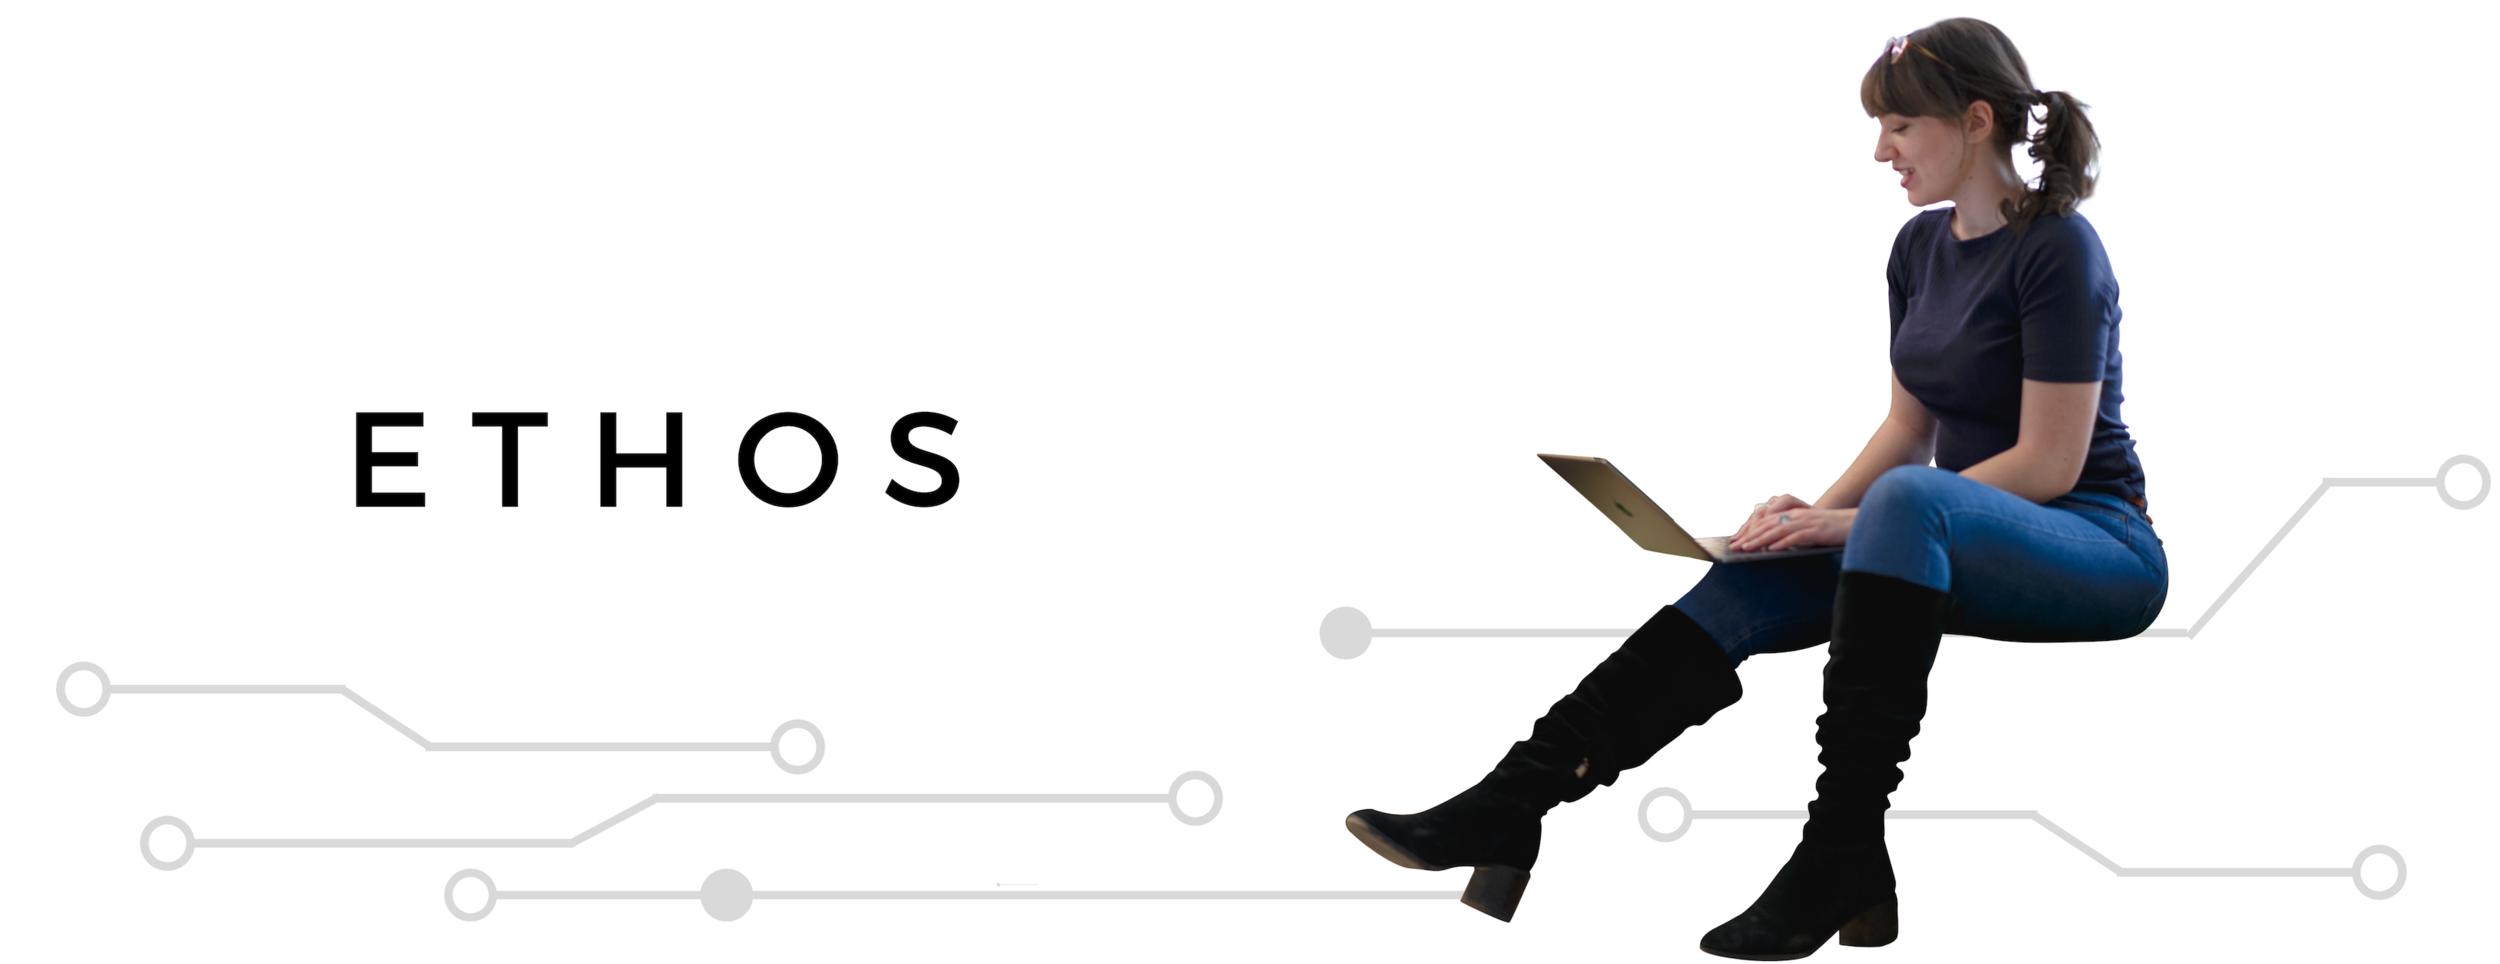 ethos-banner.png